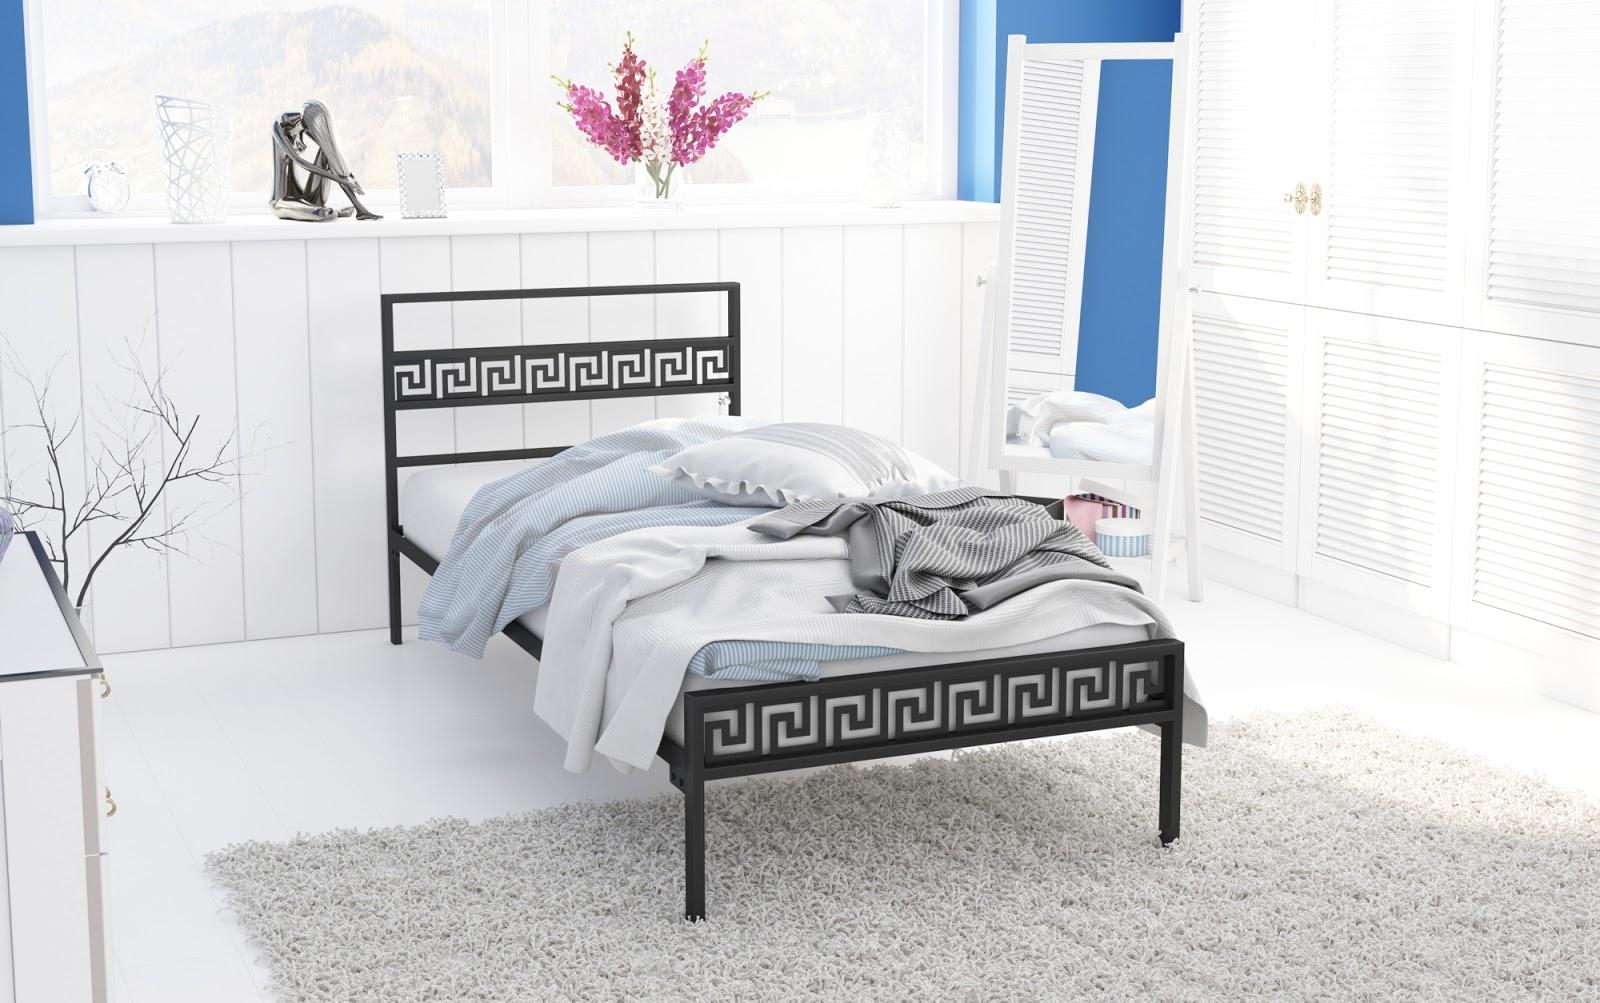 Łóżko metalowe wzór 9